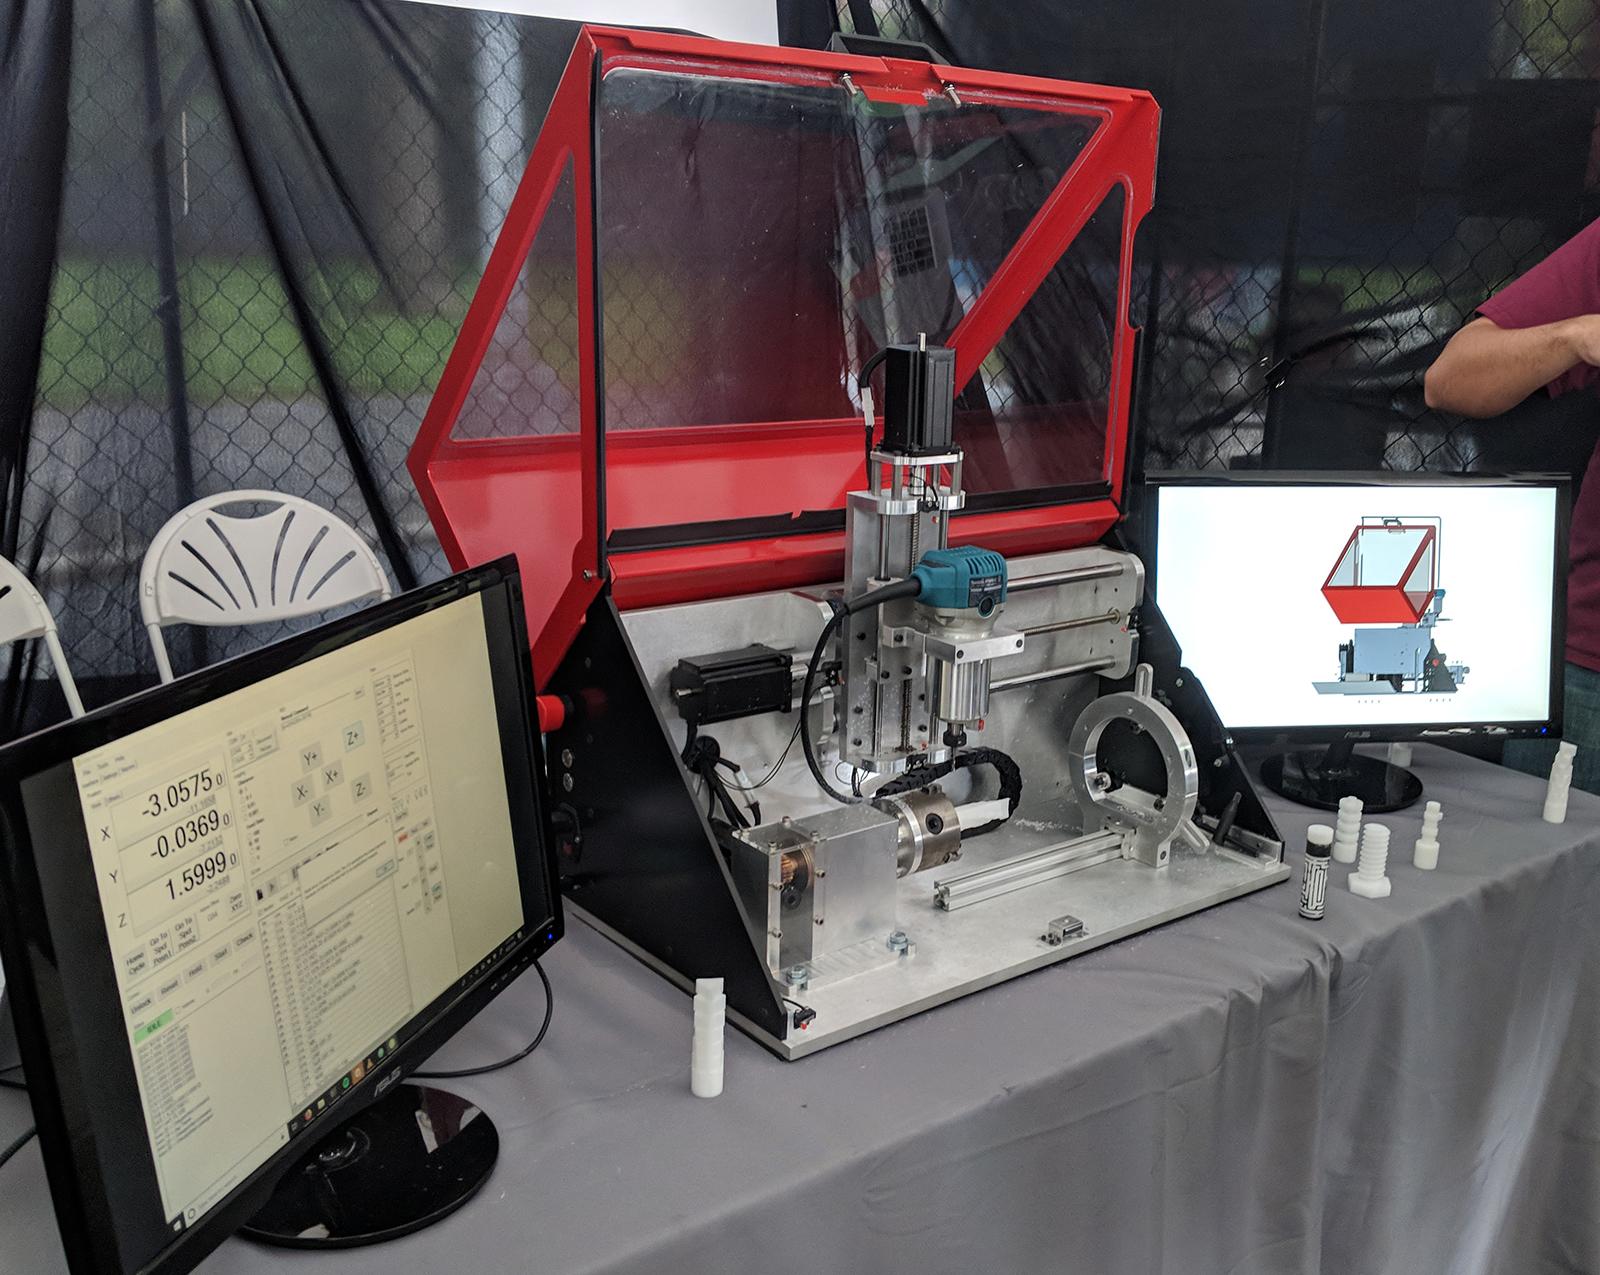 A Rotary Axis CNC Machine   Hackaday